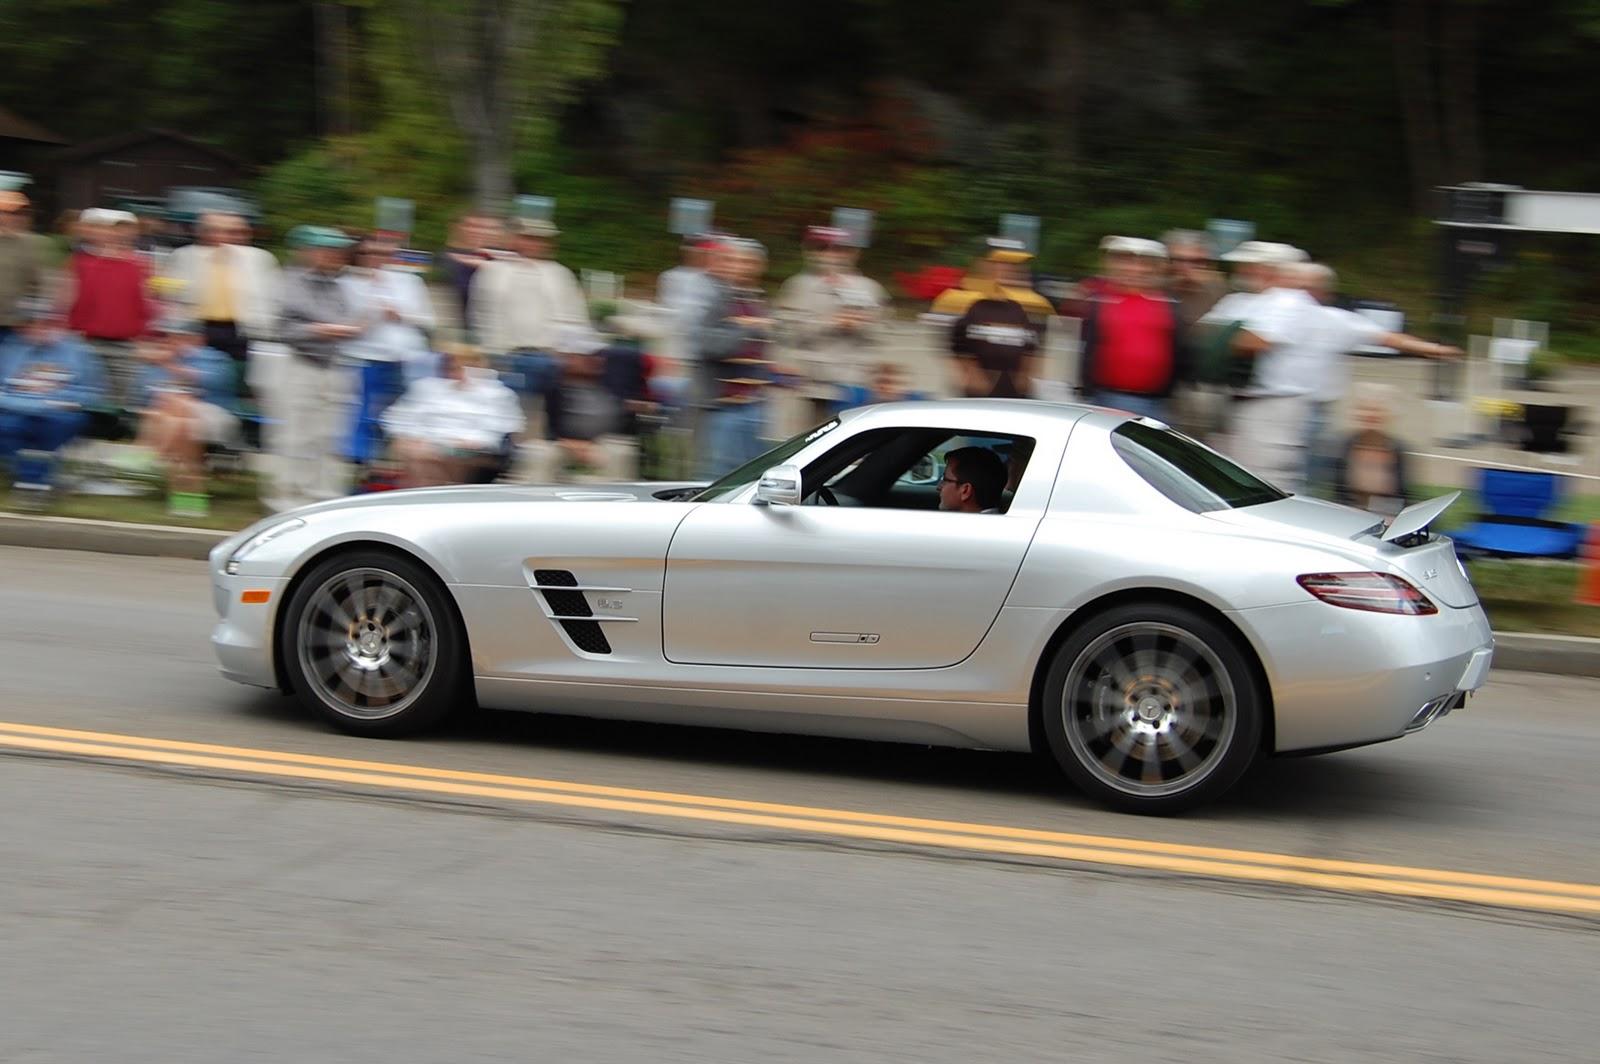 Watkins Glen Vintage Races 2010 Ran When Parked